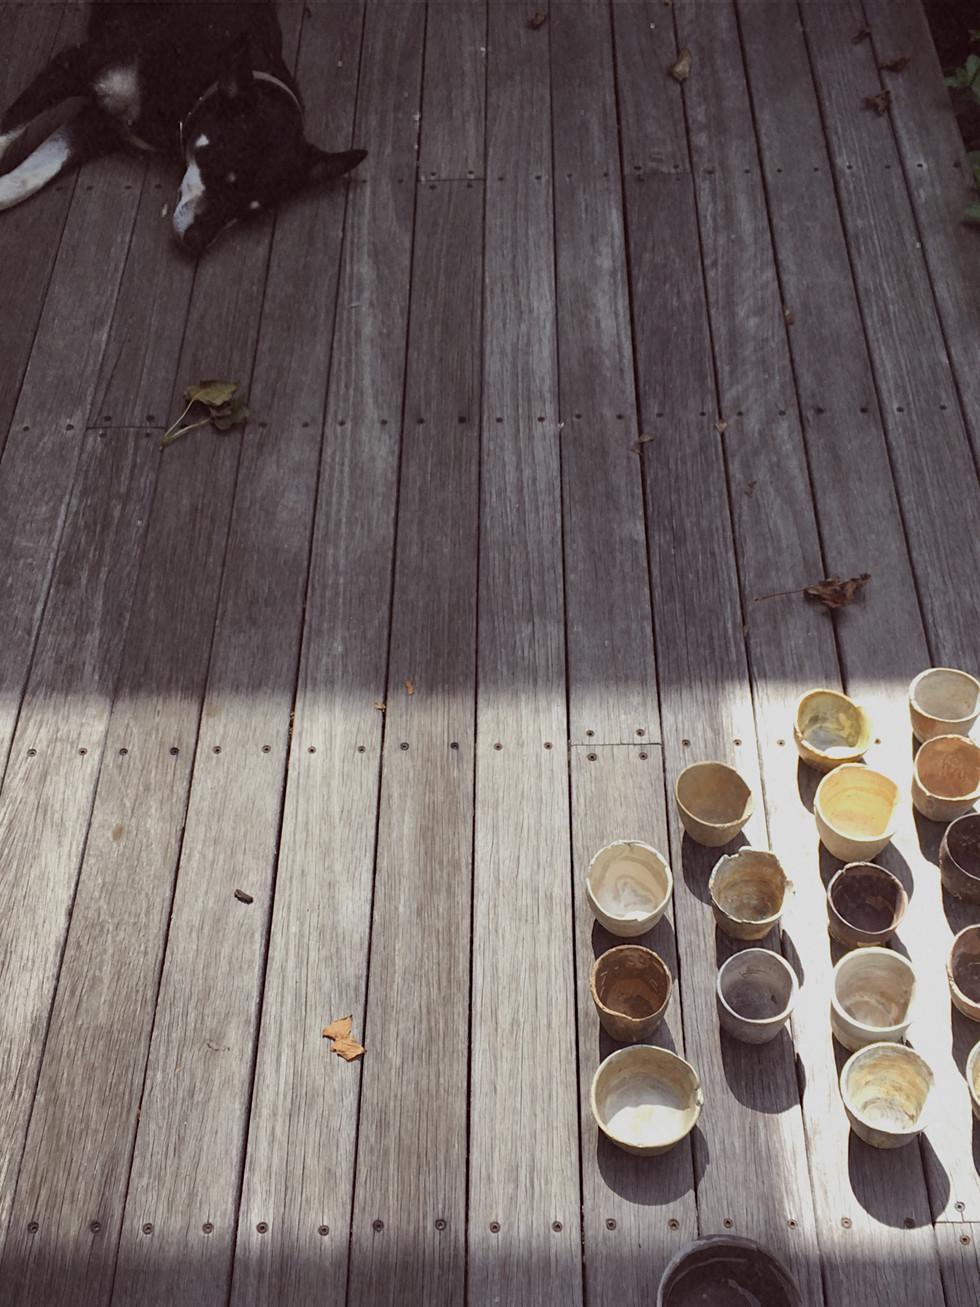 tania rollond_dog deck_2020.jpg